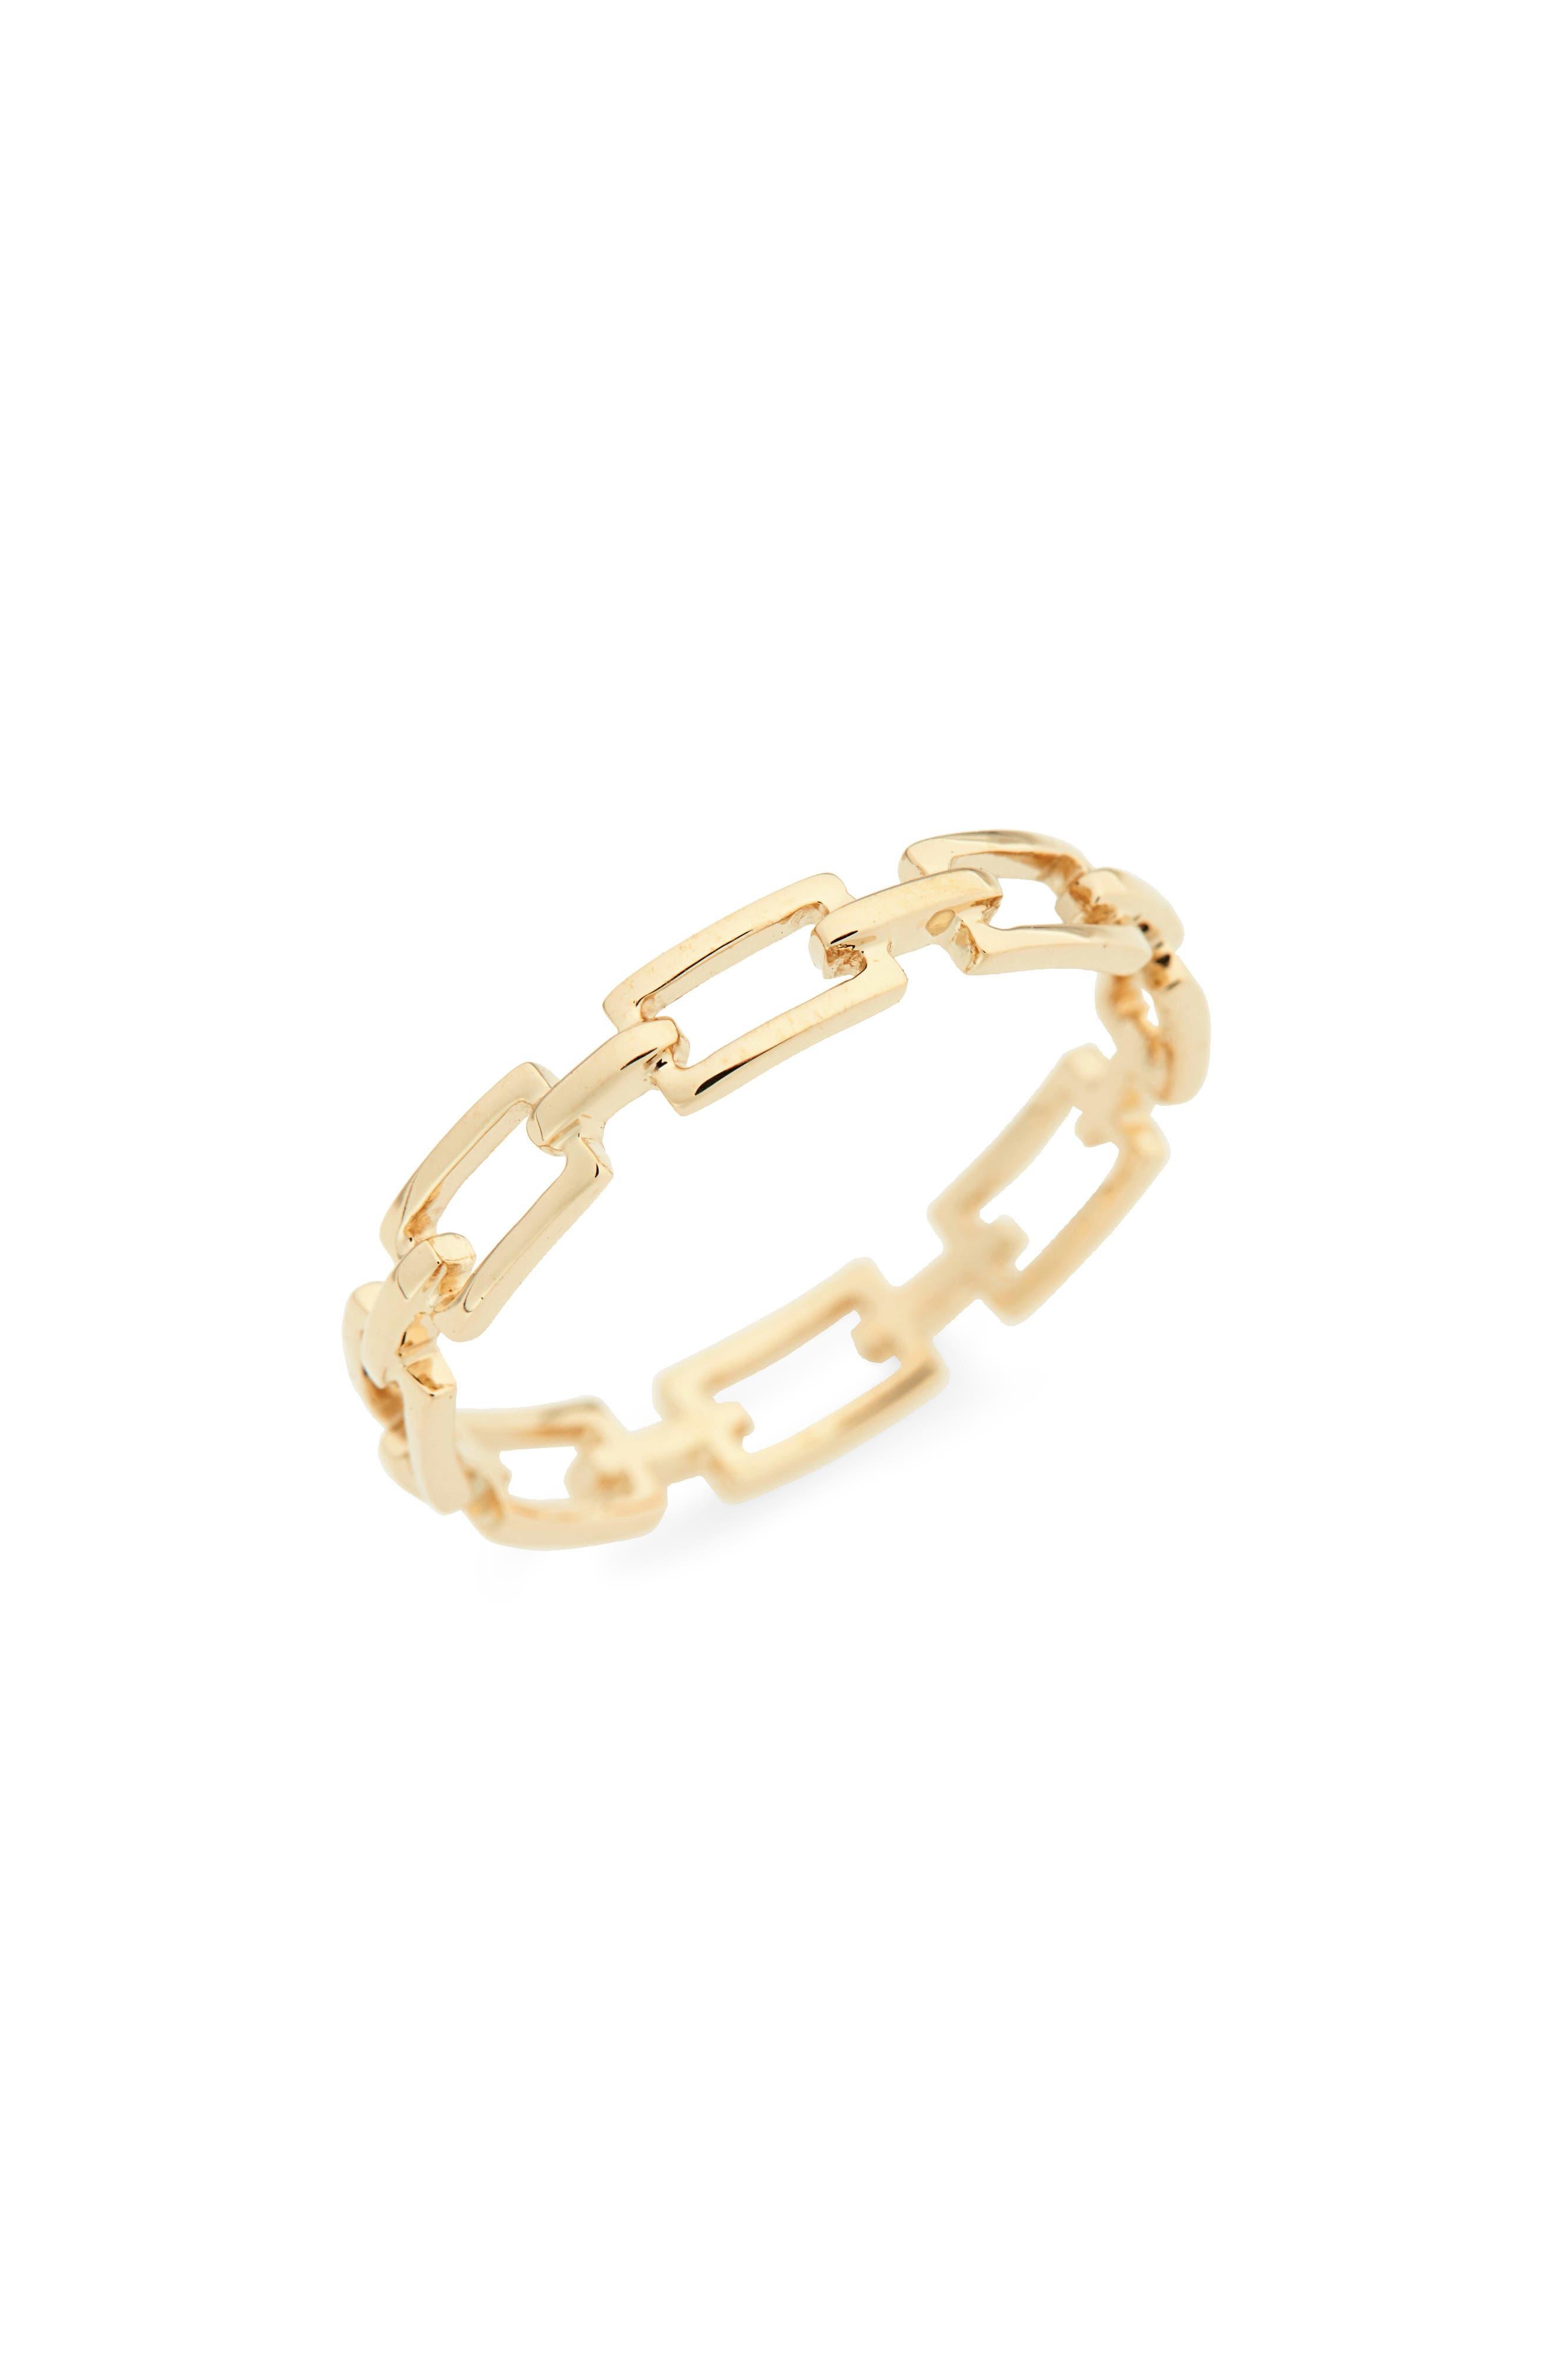 14-Karat Gold Link Stacking Ring,                             Main thumbnail 1, color,                             YELLOW GOLD